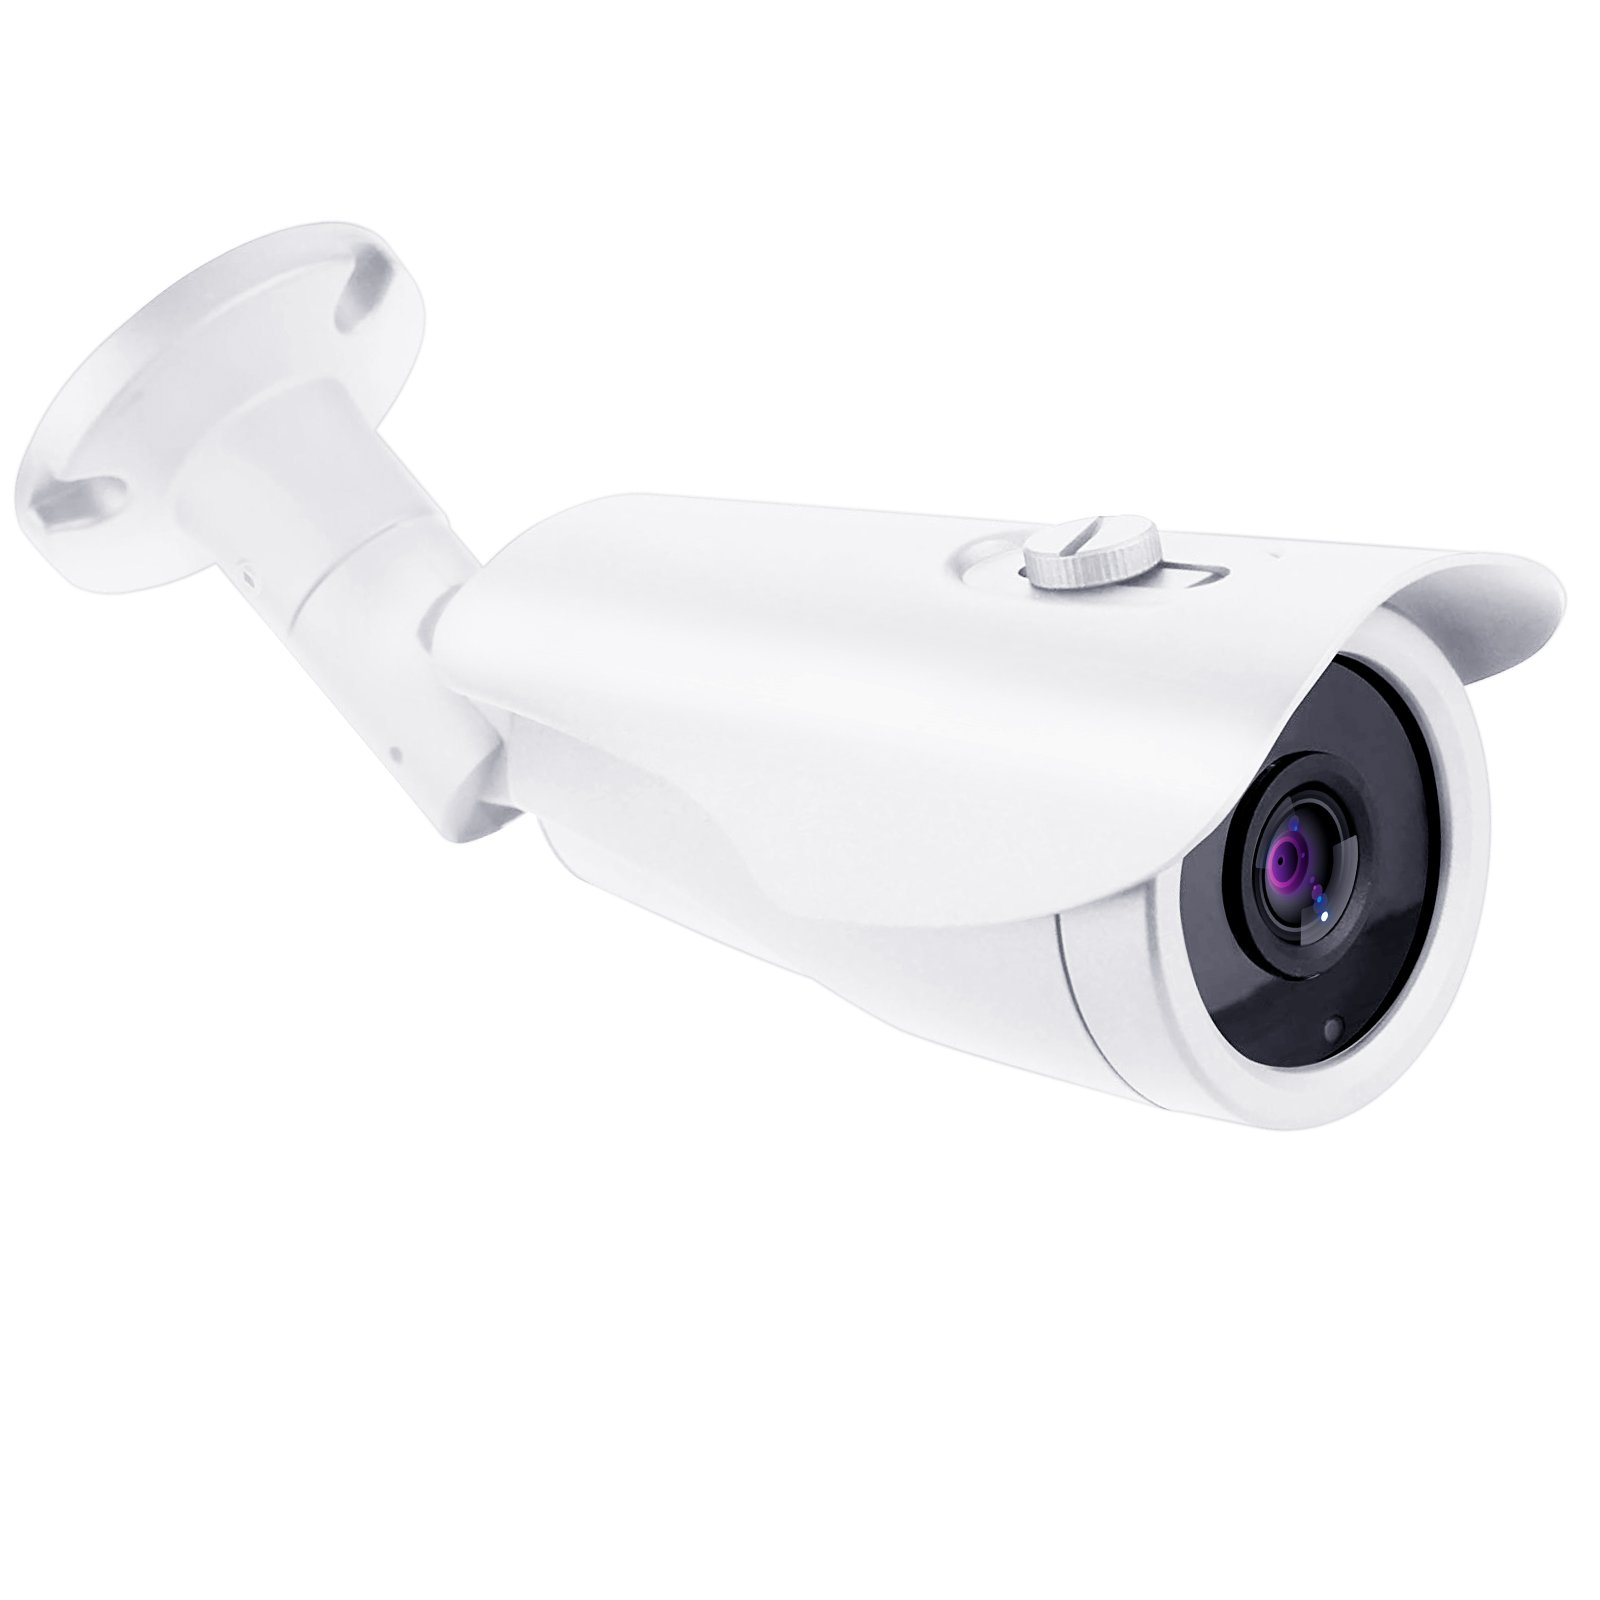 HDView 5MP TVI / AHD Camera, 4MP CVI Camera, SONY Sensor, HD Megapixel Bullet Security Camera 3.6mm Lens Turbo Platinum Infrared Night Vision IR-CUT DNR UTC OSD by HDView